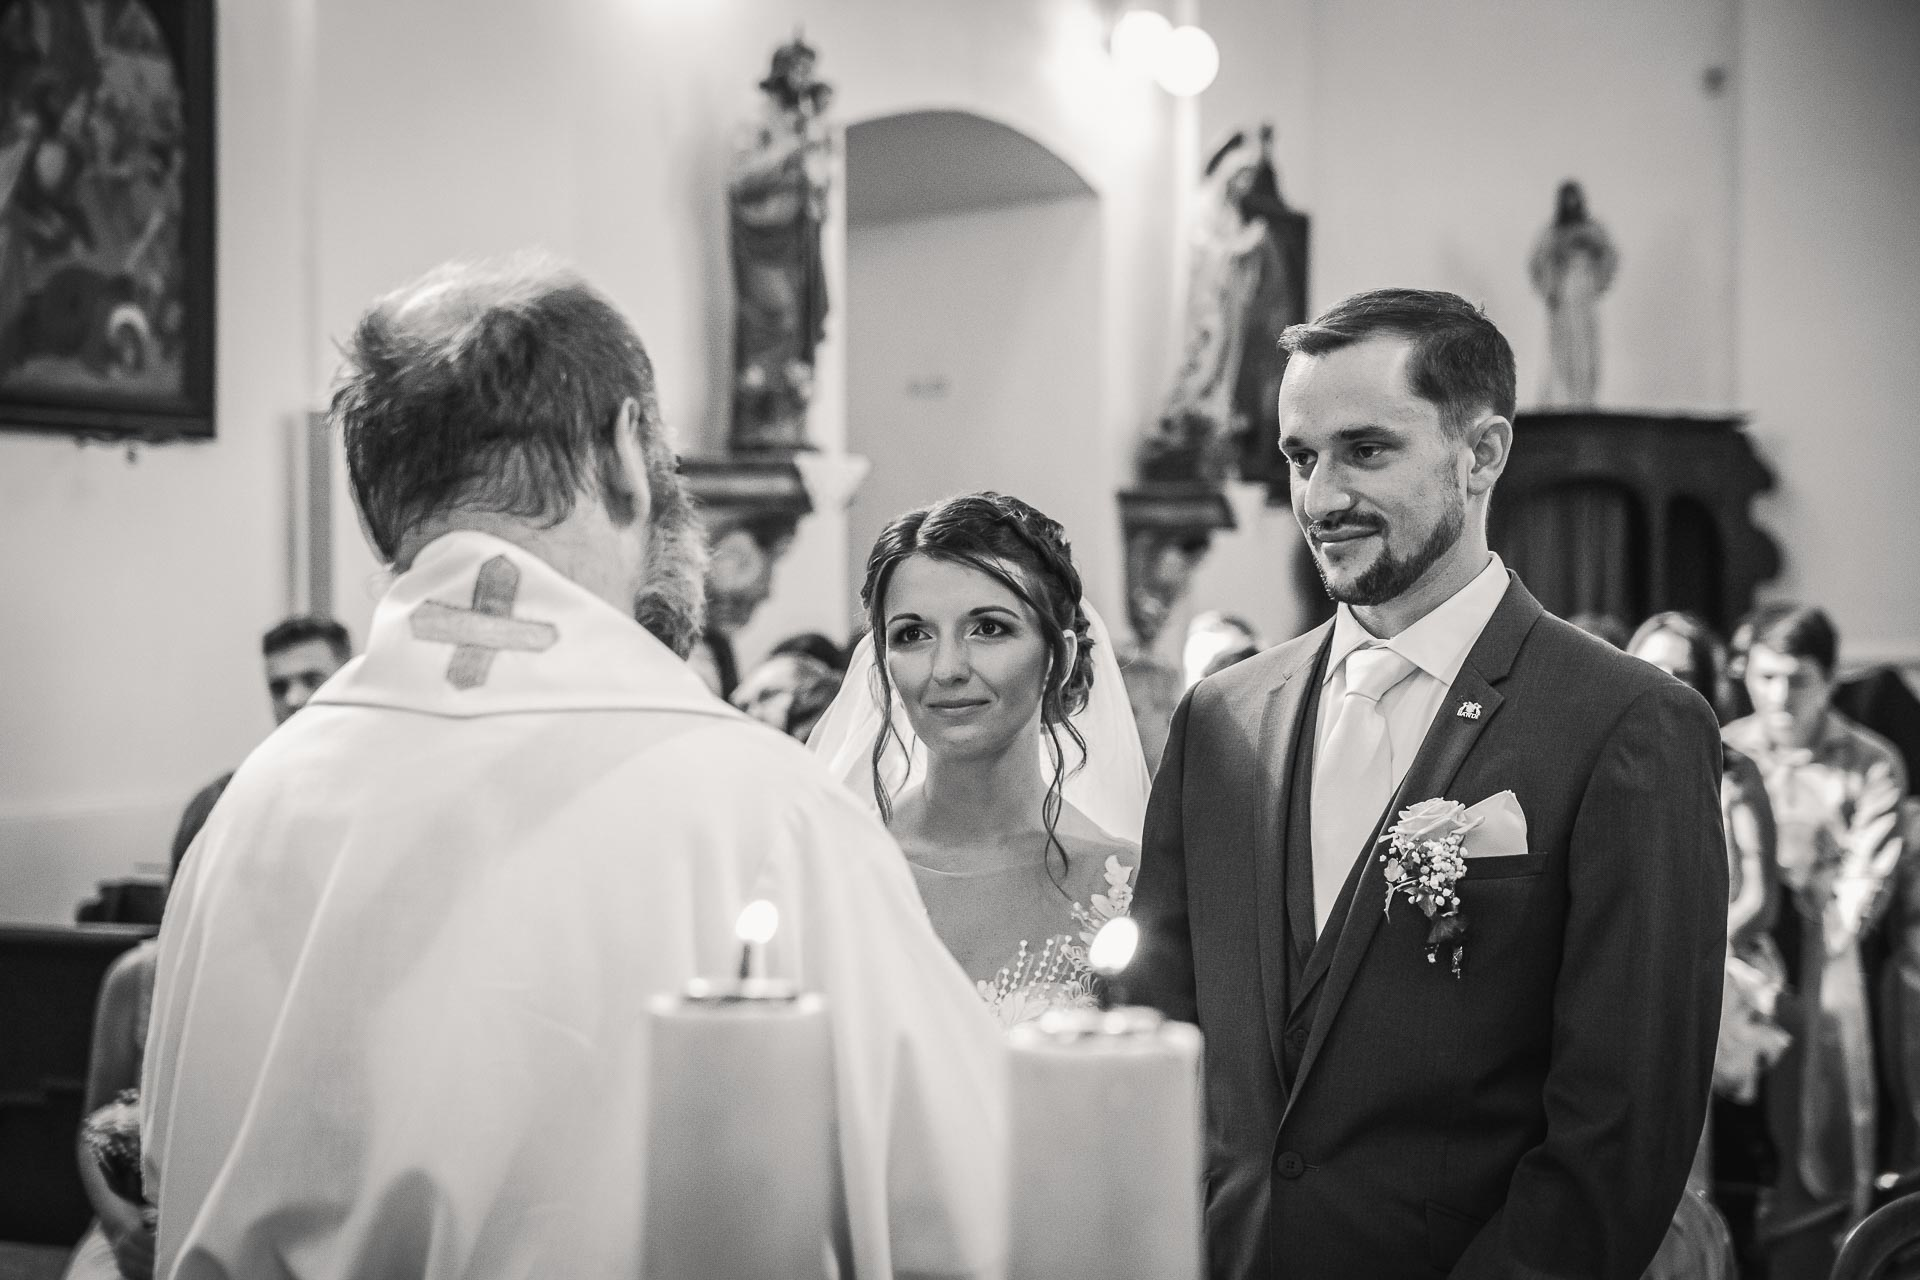 svatební-fotograf-wedding-svatebni-video-orlík-vltava-kostel-statek-stodola-boho-svatba-Beautyfoto-225